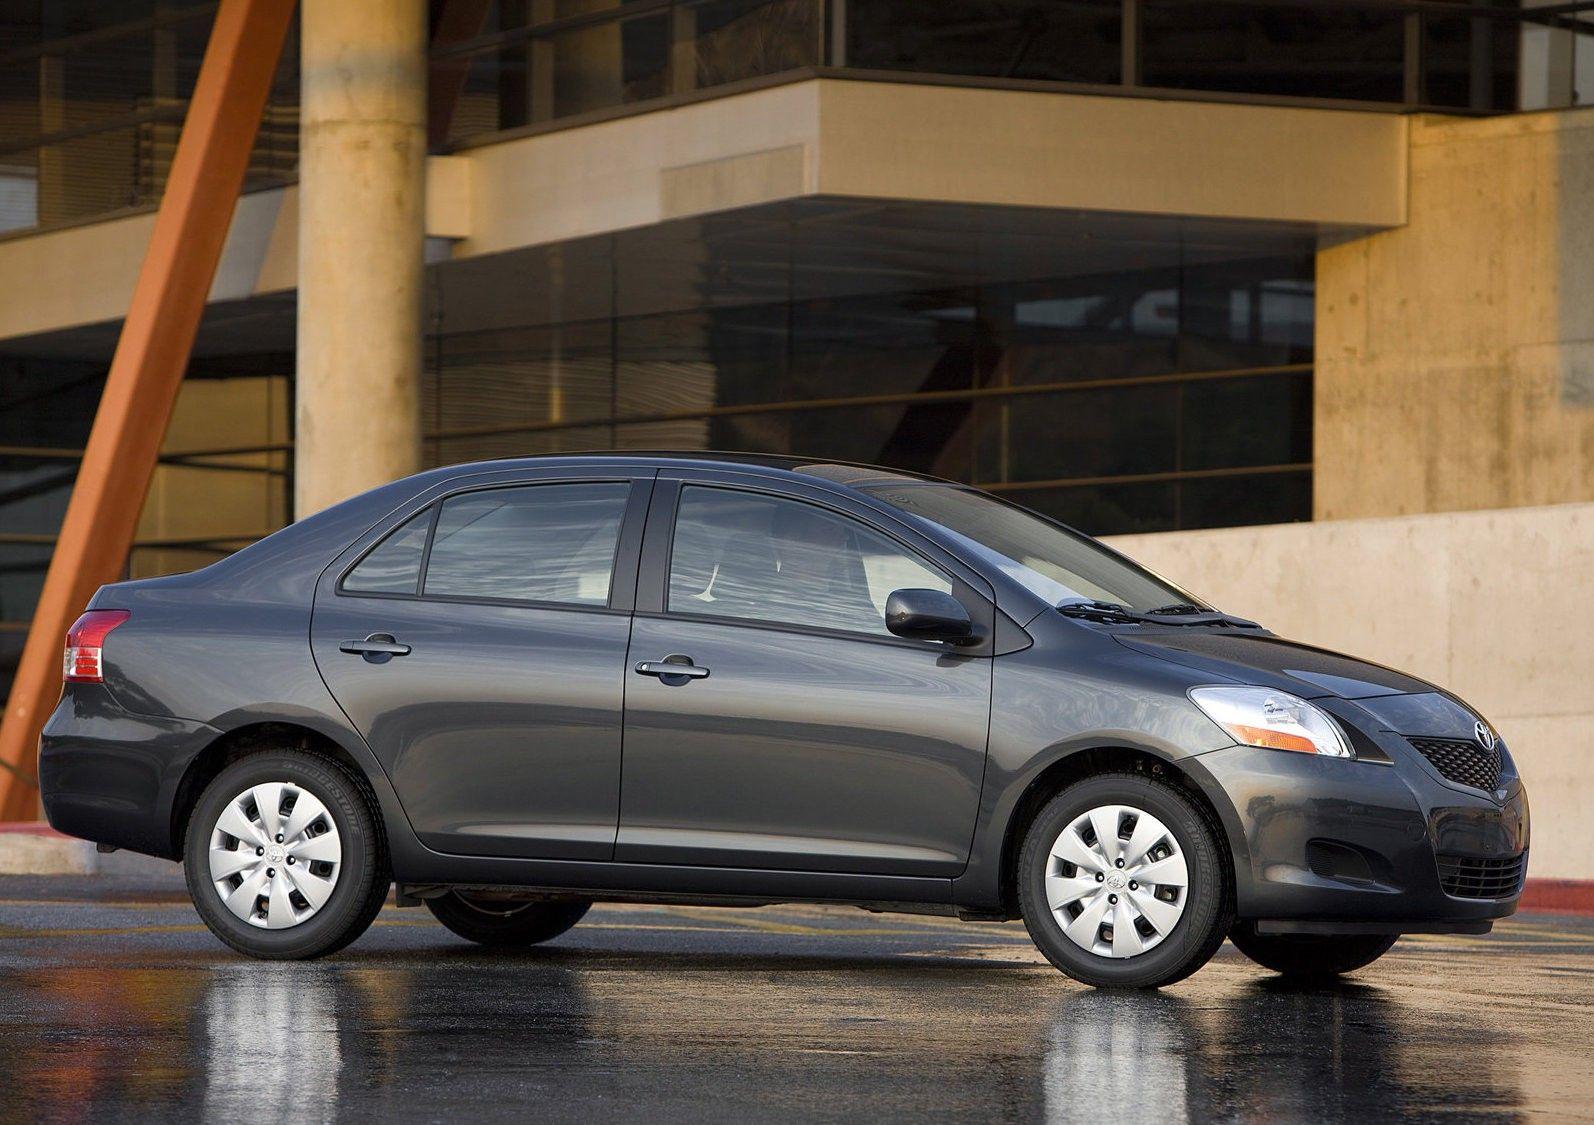 Kelebihan Toyota Yaris 2006 Murah Berkualitas